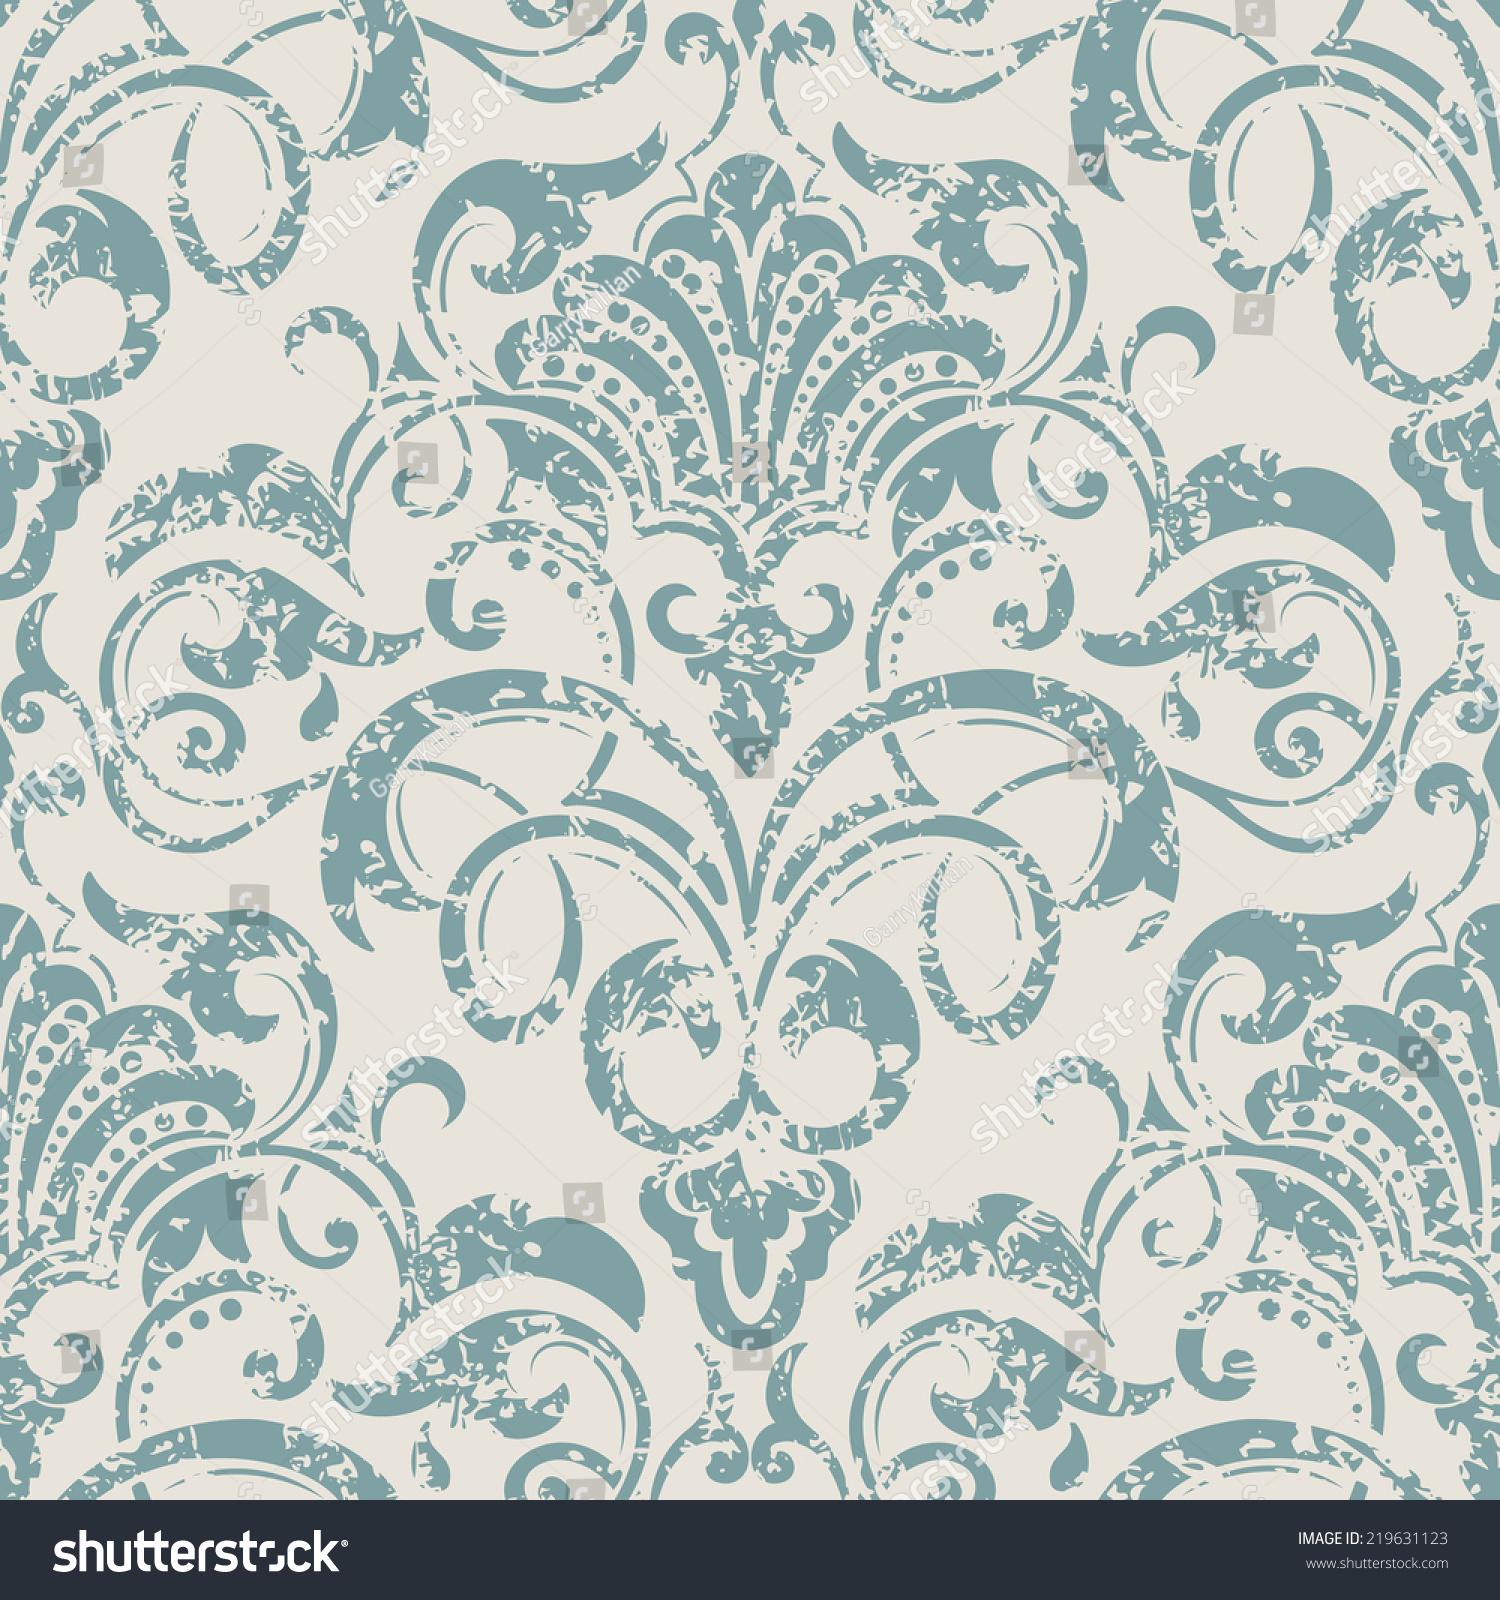 damask wallpaper glamorous and elegant - photo #25